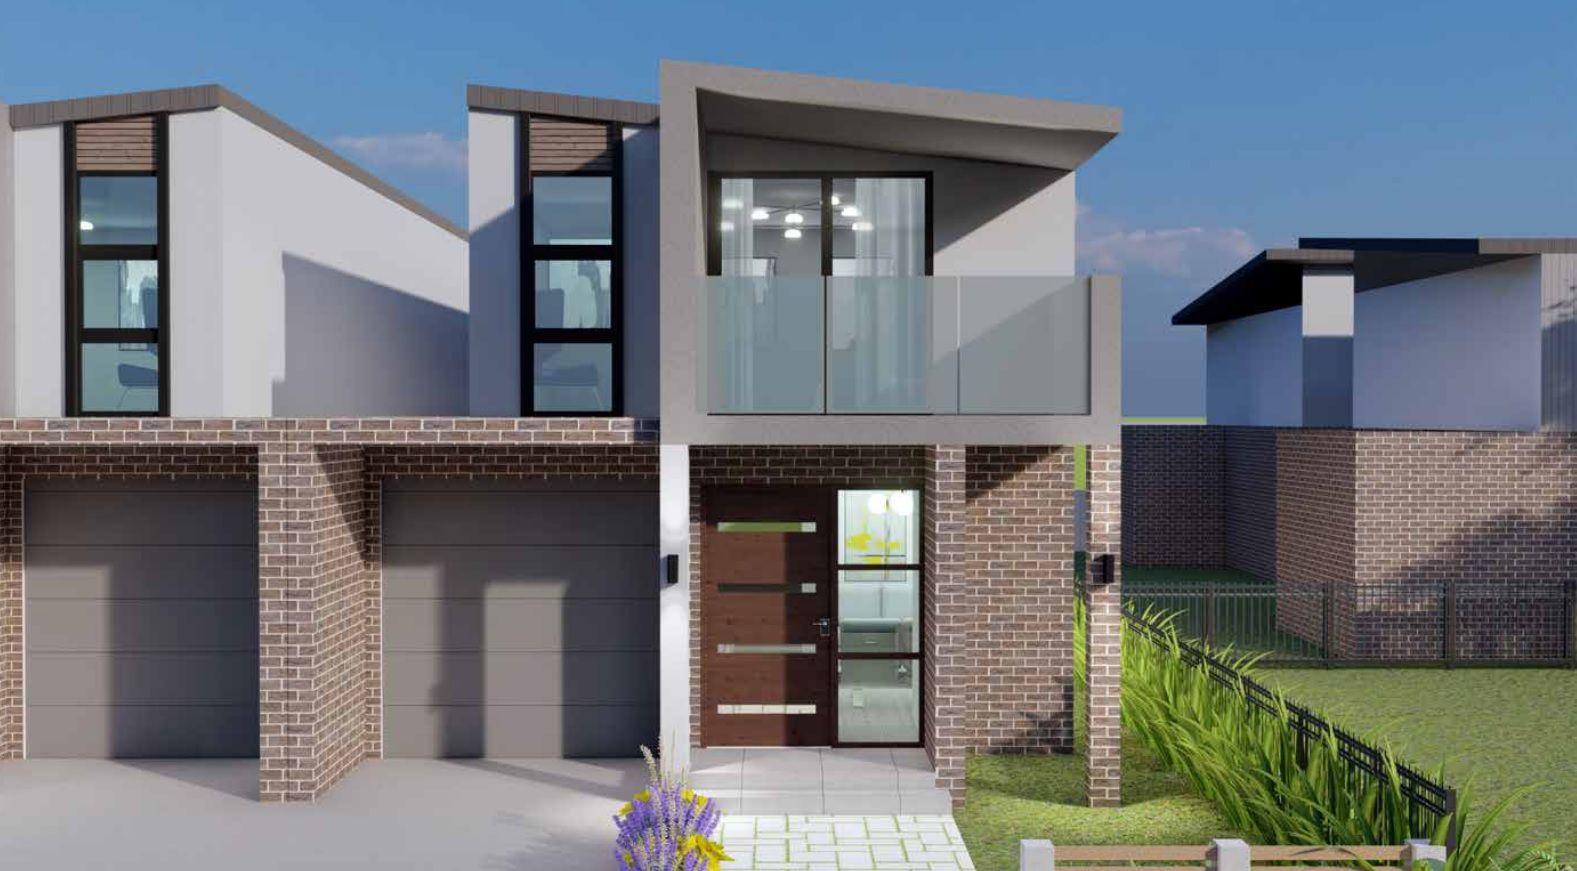 Lot 20 Hynds Road, Box Hill NSW 2765